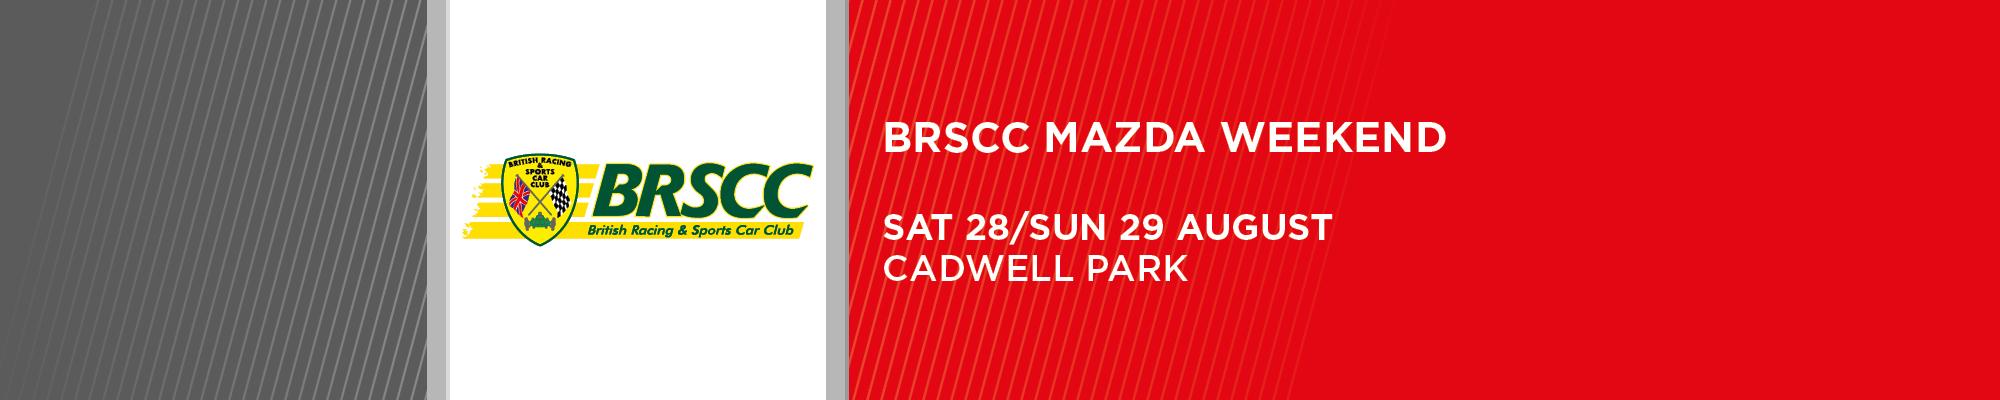 BRSCC Mazda Weekend